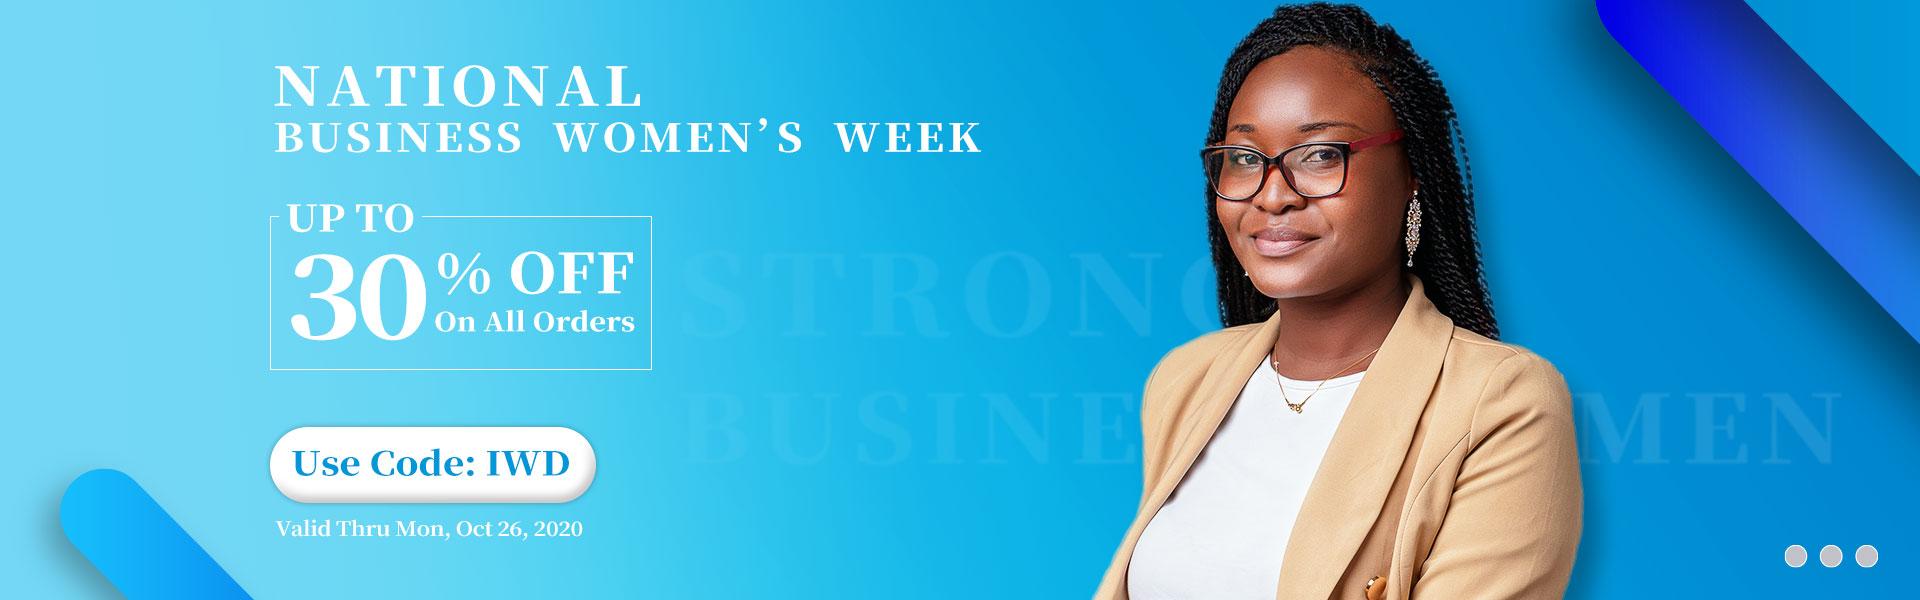 National Business  Women's  Week